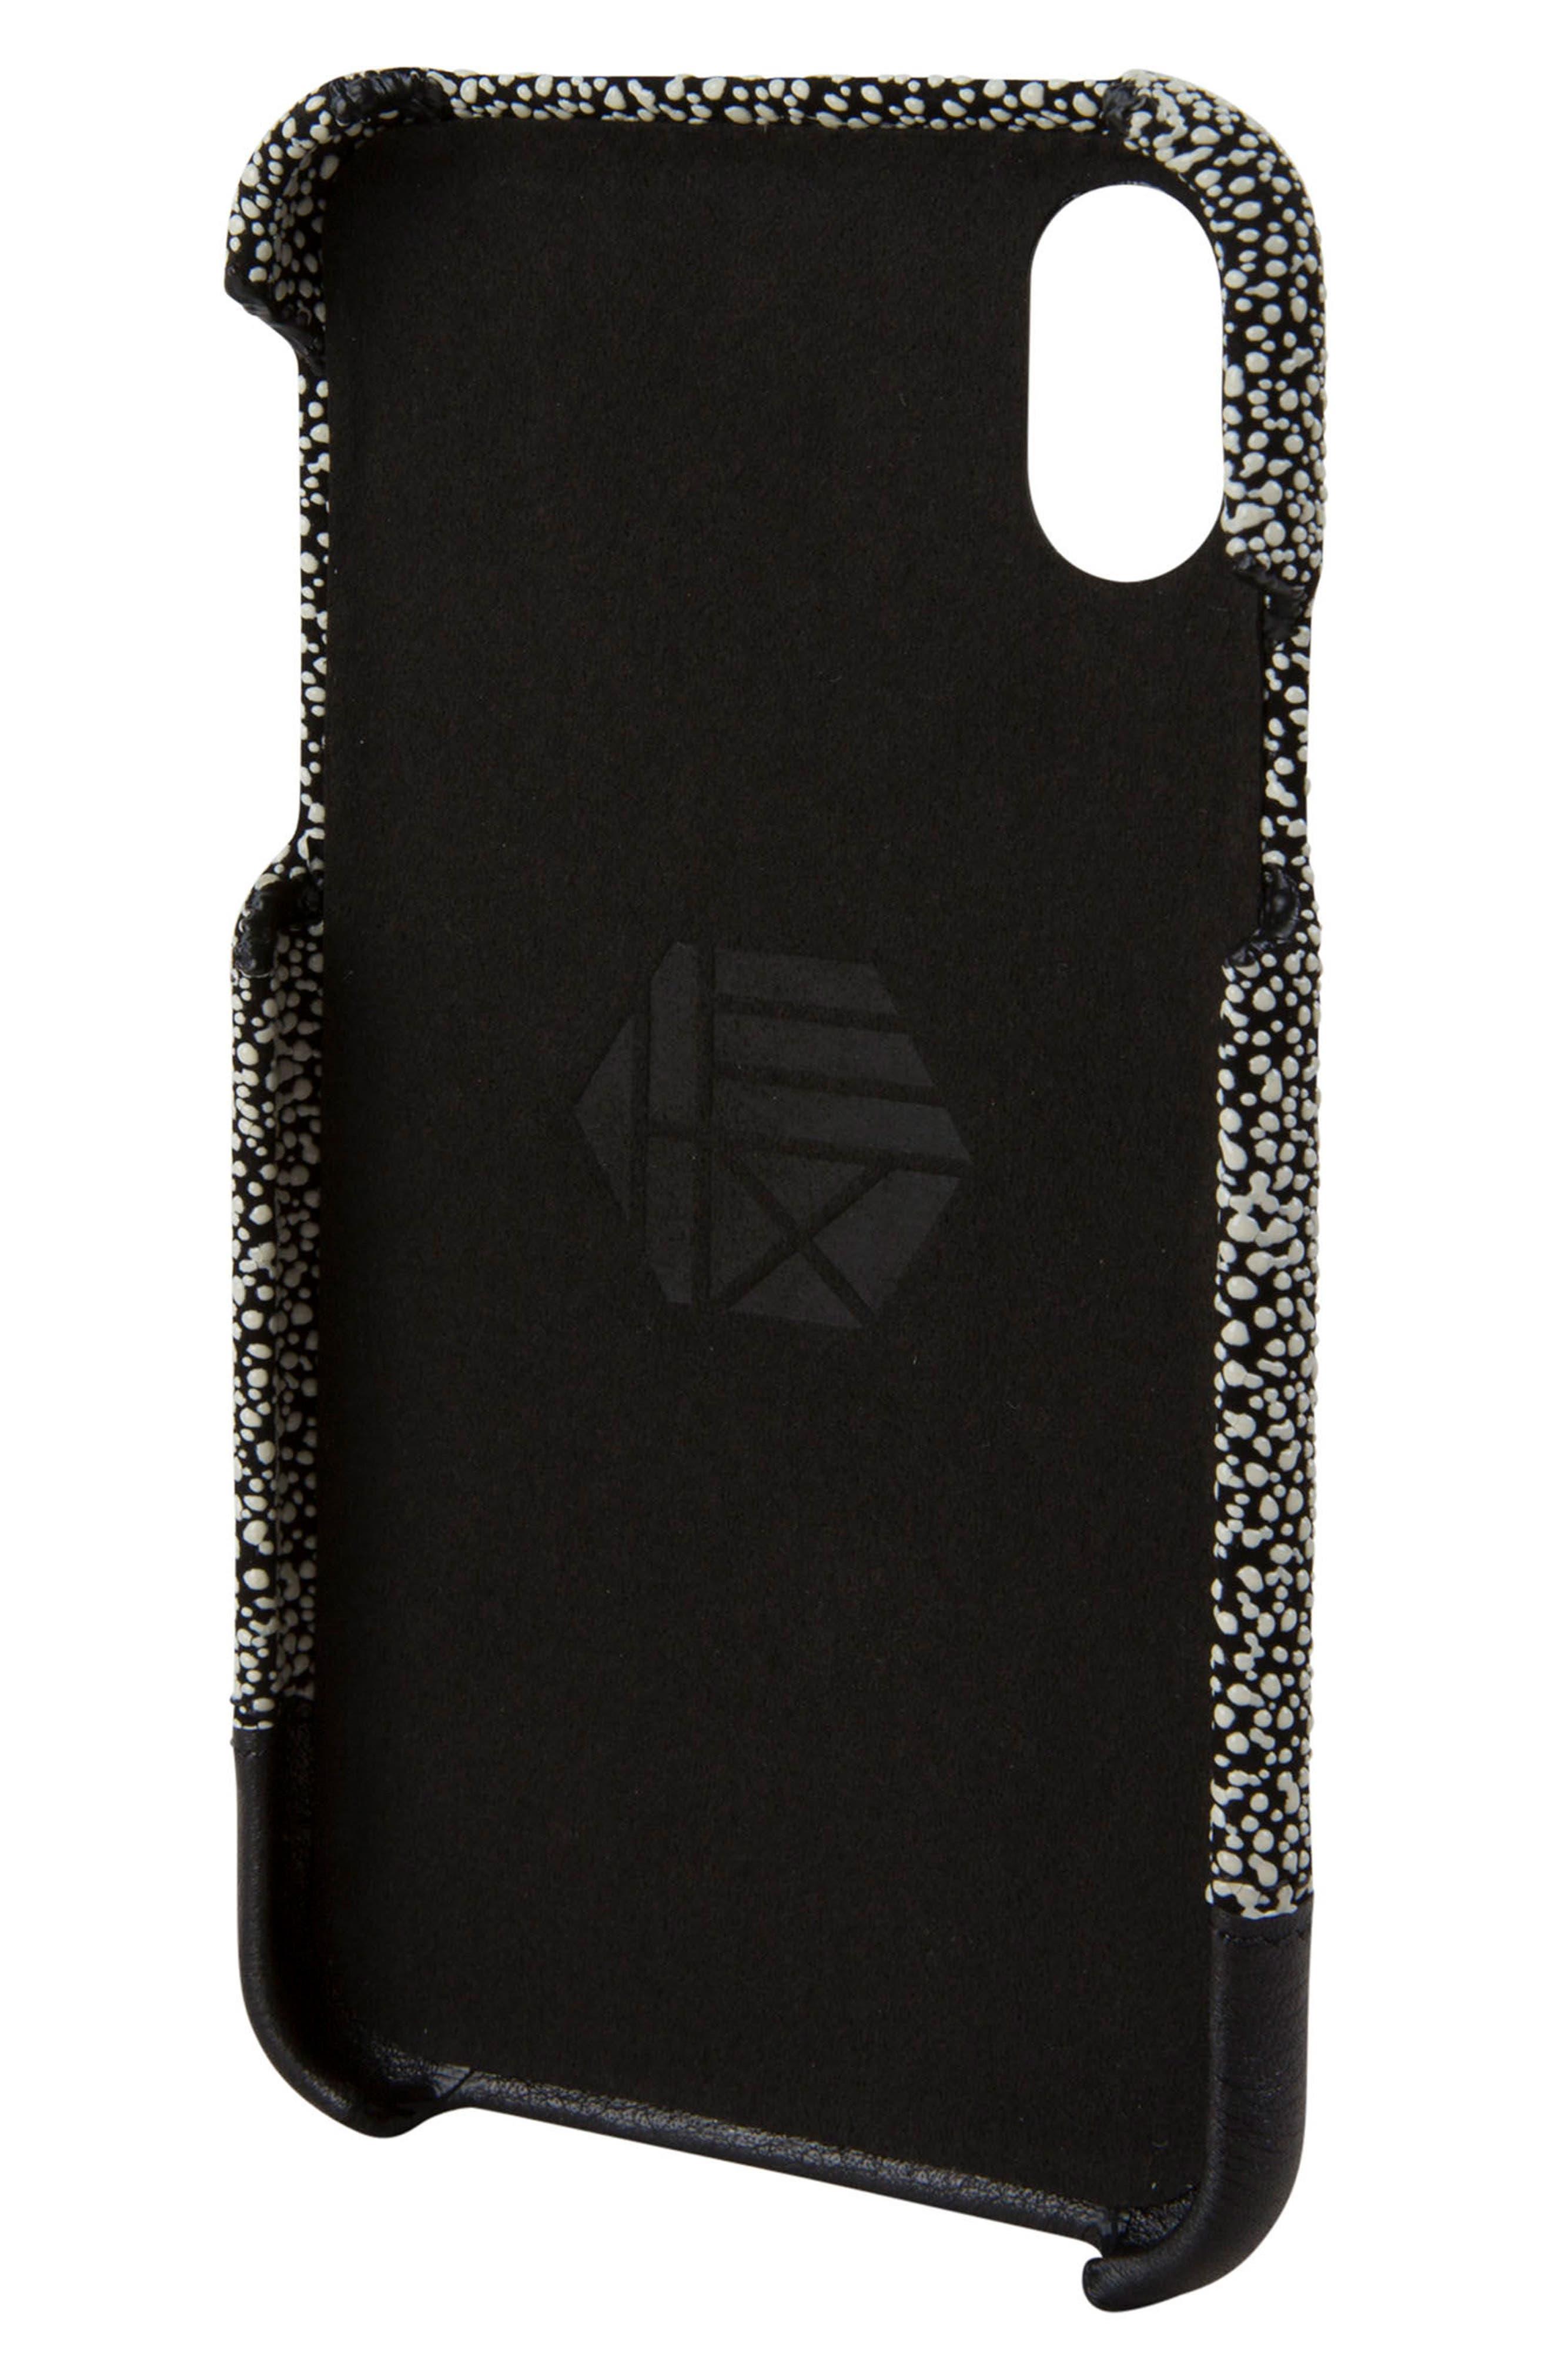 Focus Leather iPhone X Case,                             Alternate thumbnail 3, color,                             Black/ White Stingray